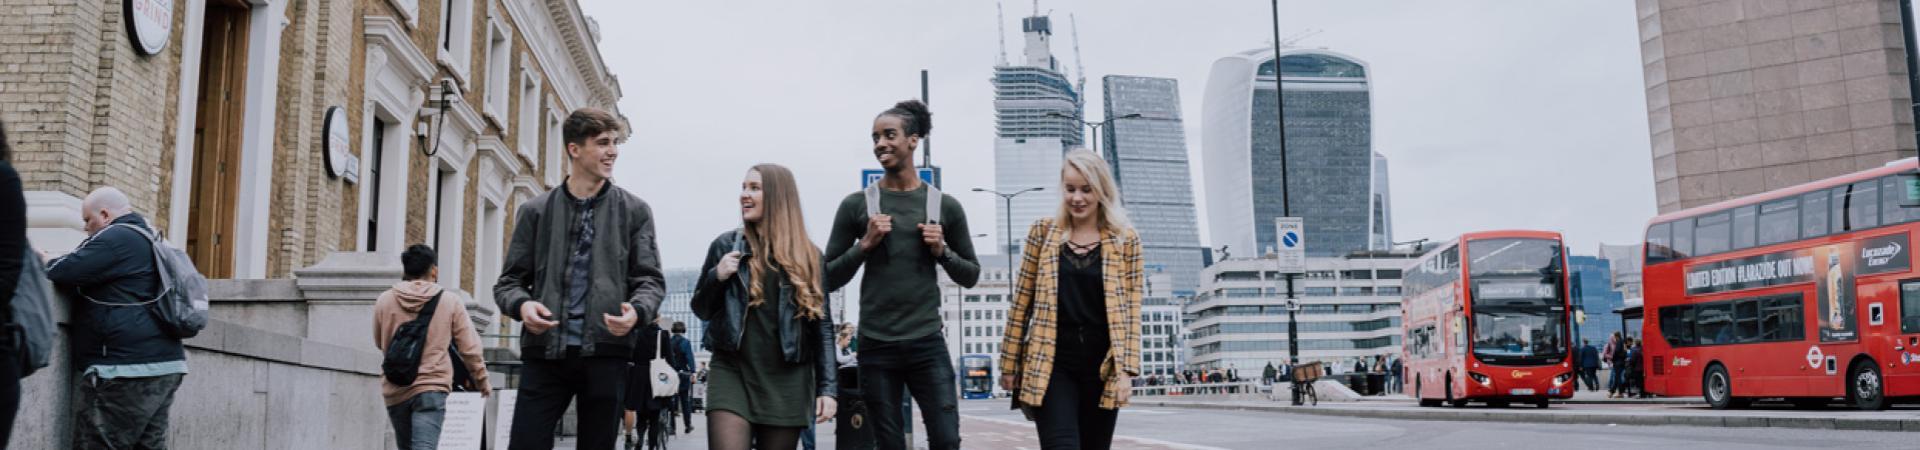 Students walking around London